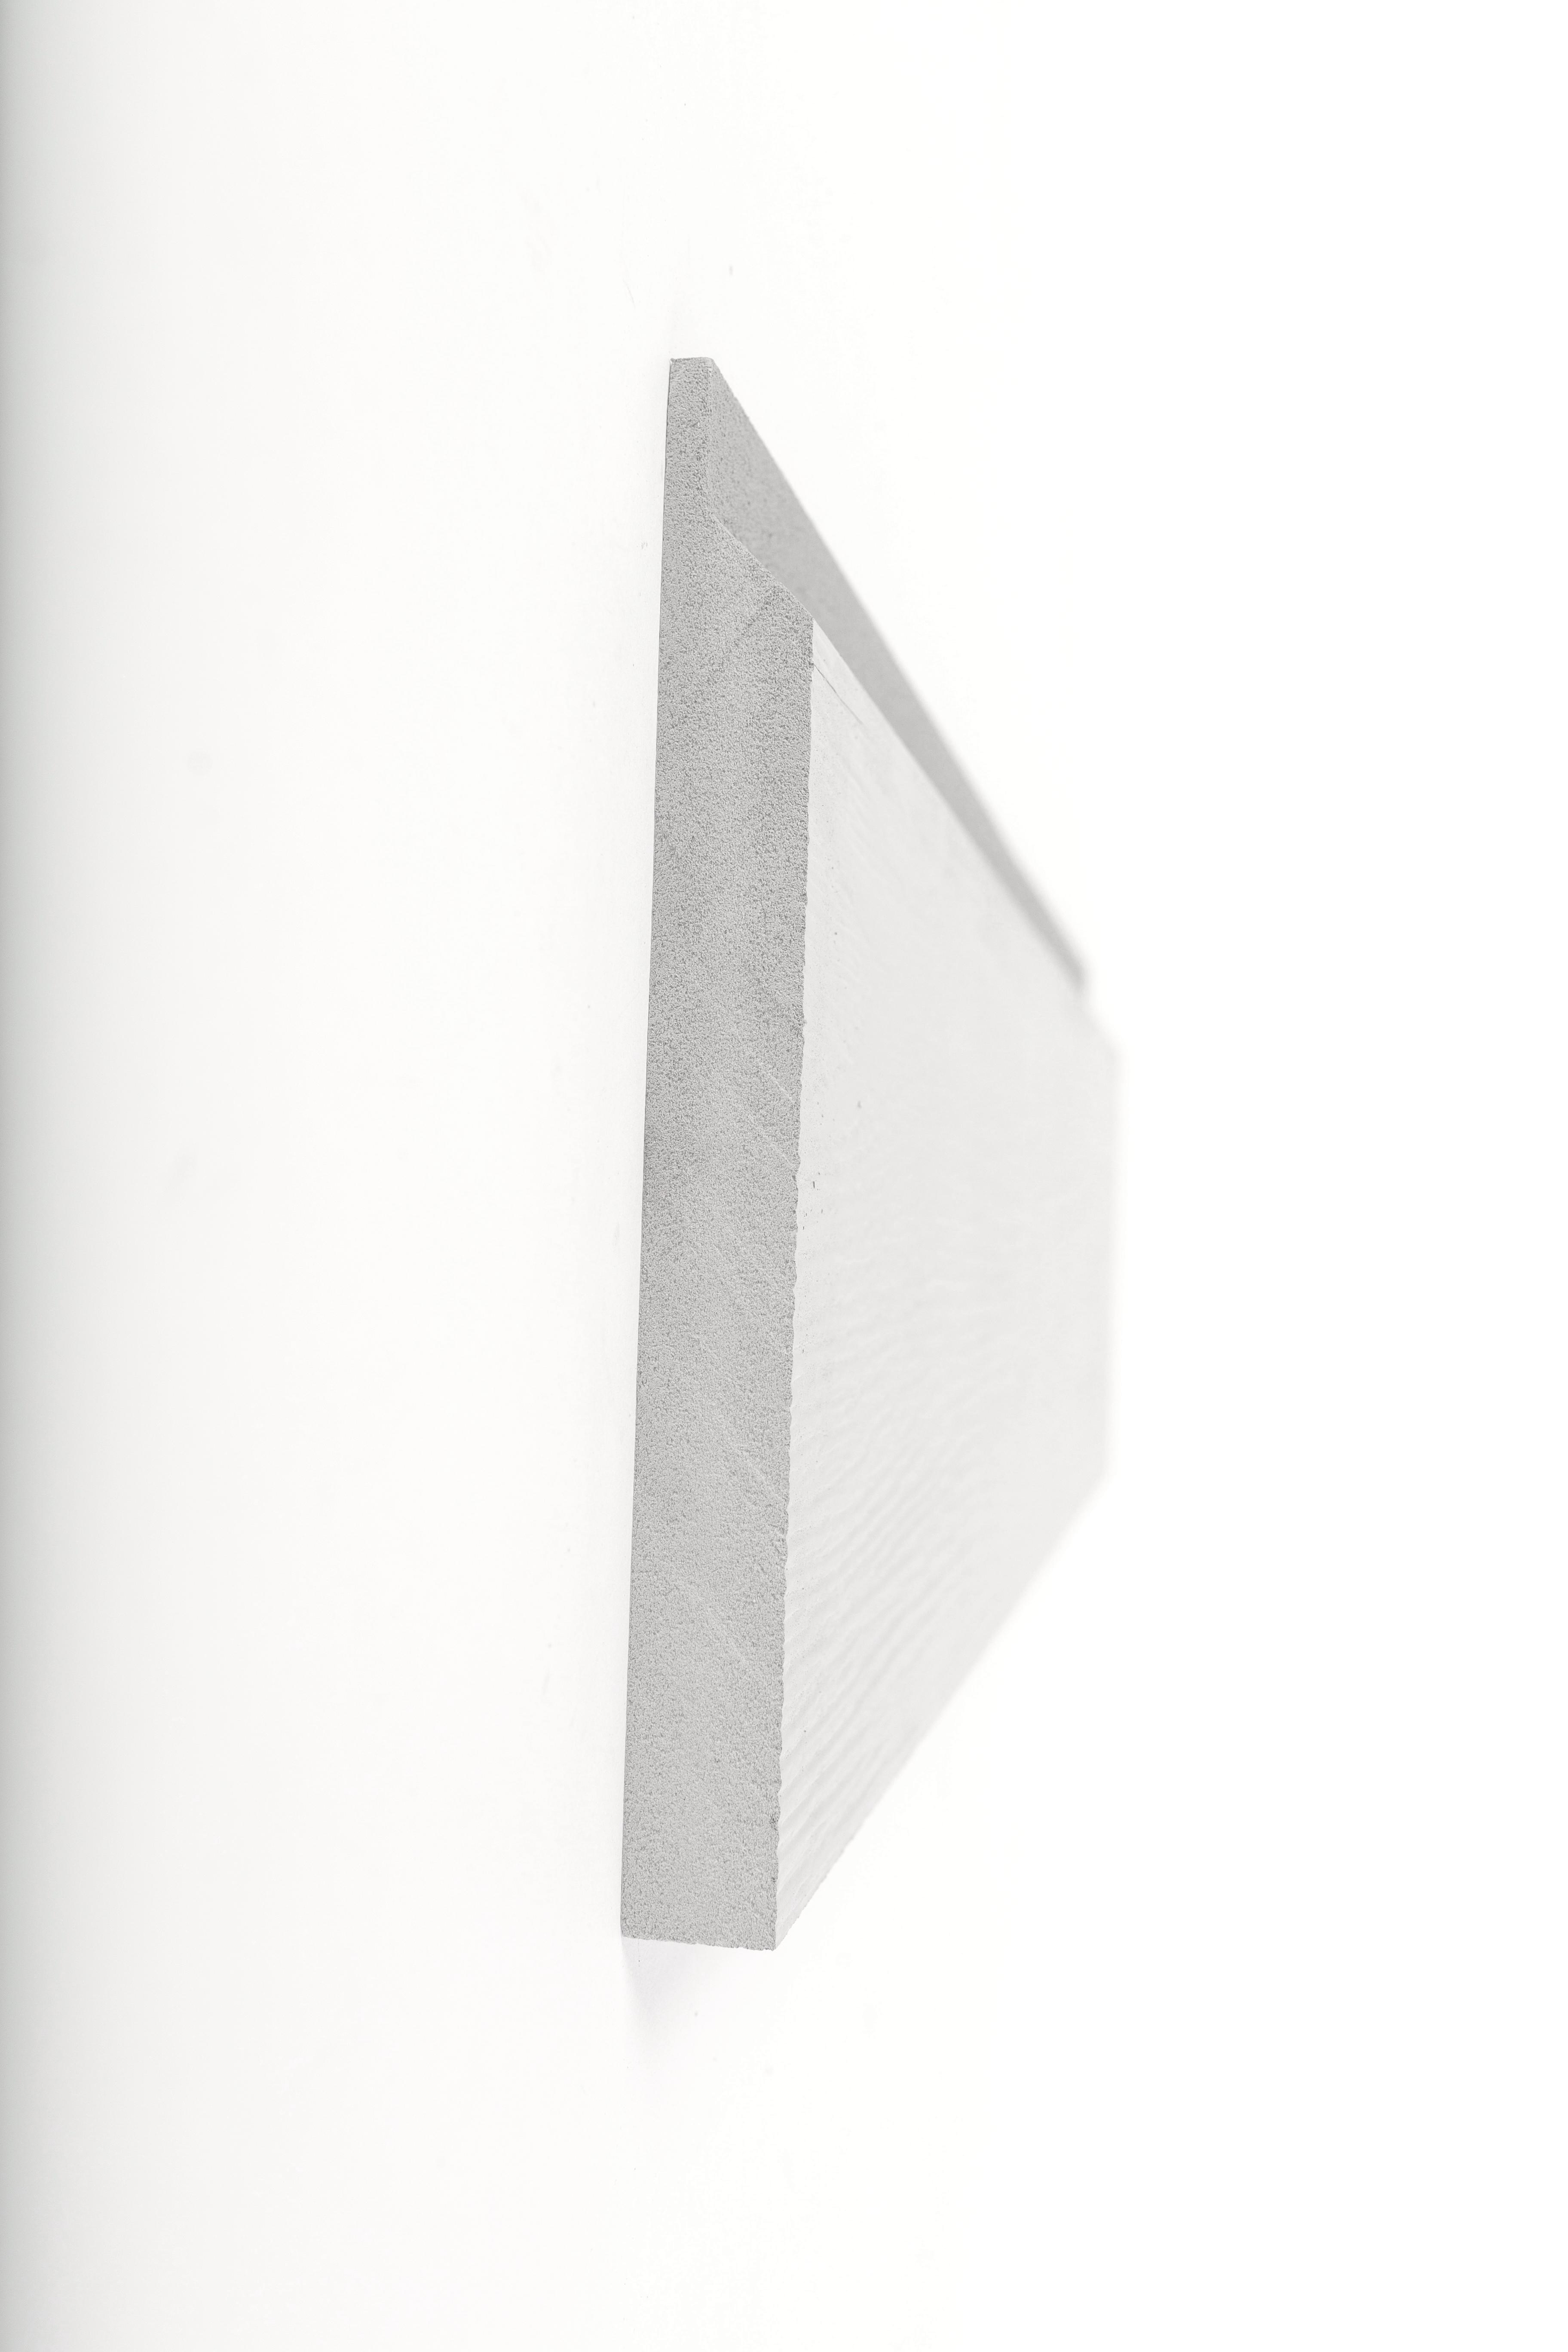 Grade Plank white